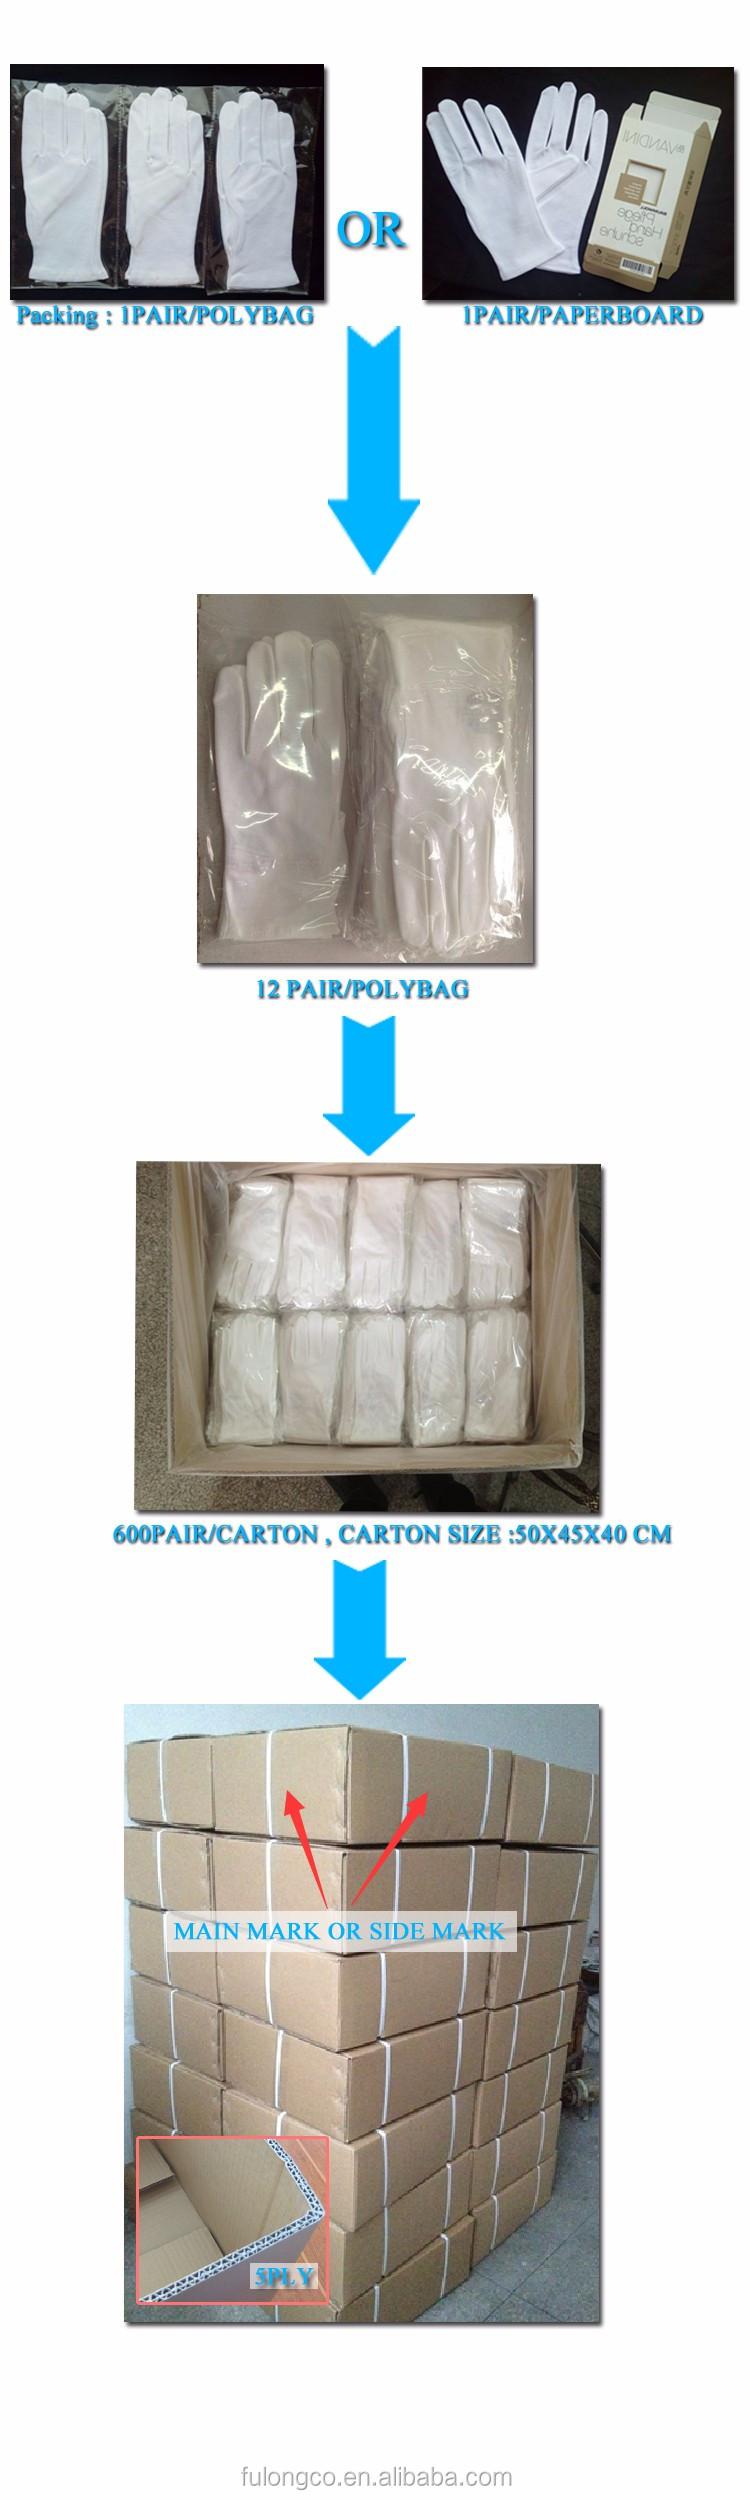 Cotton Hand Gloves Price Buy 3m Gloves Masonic White